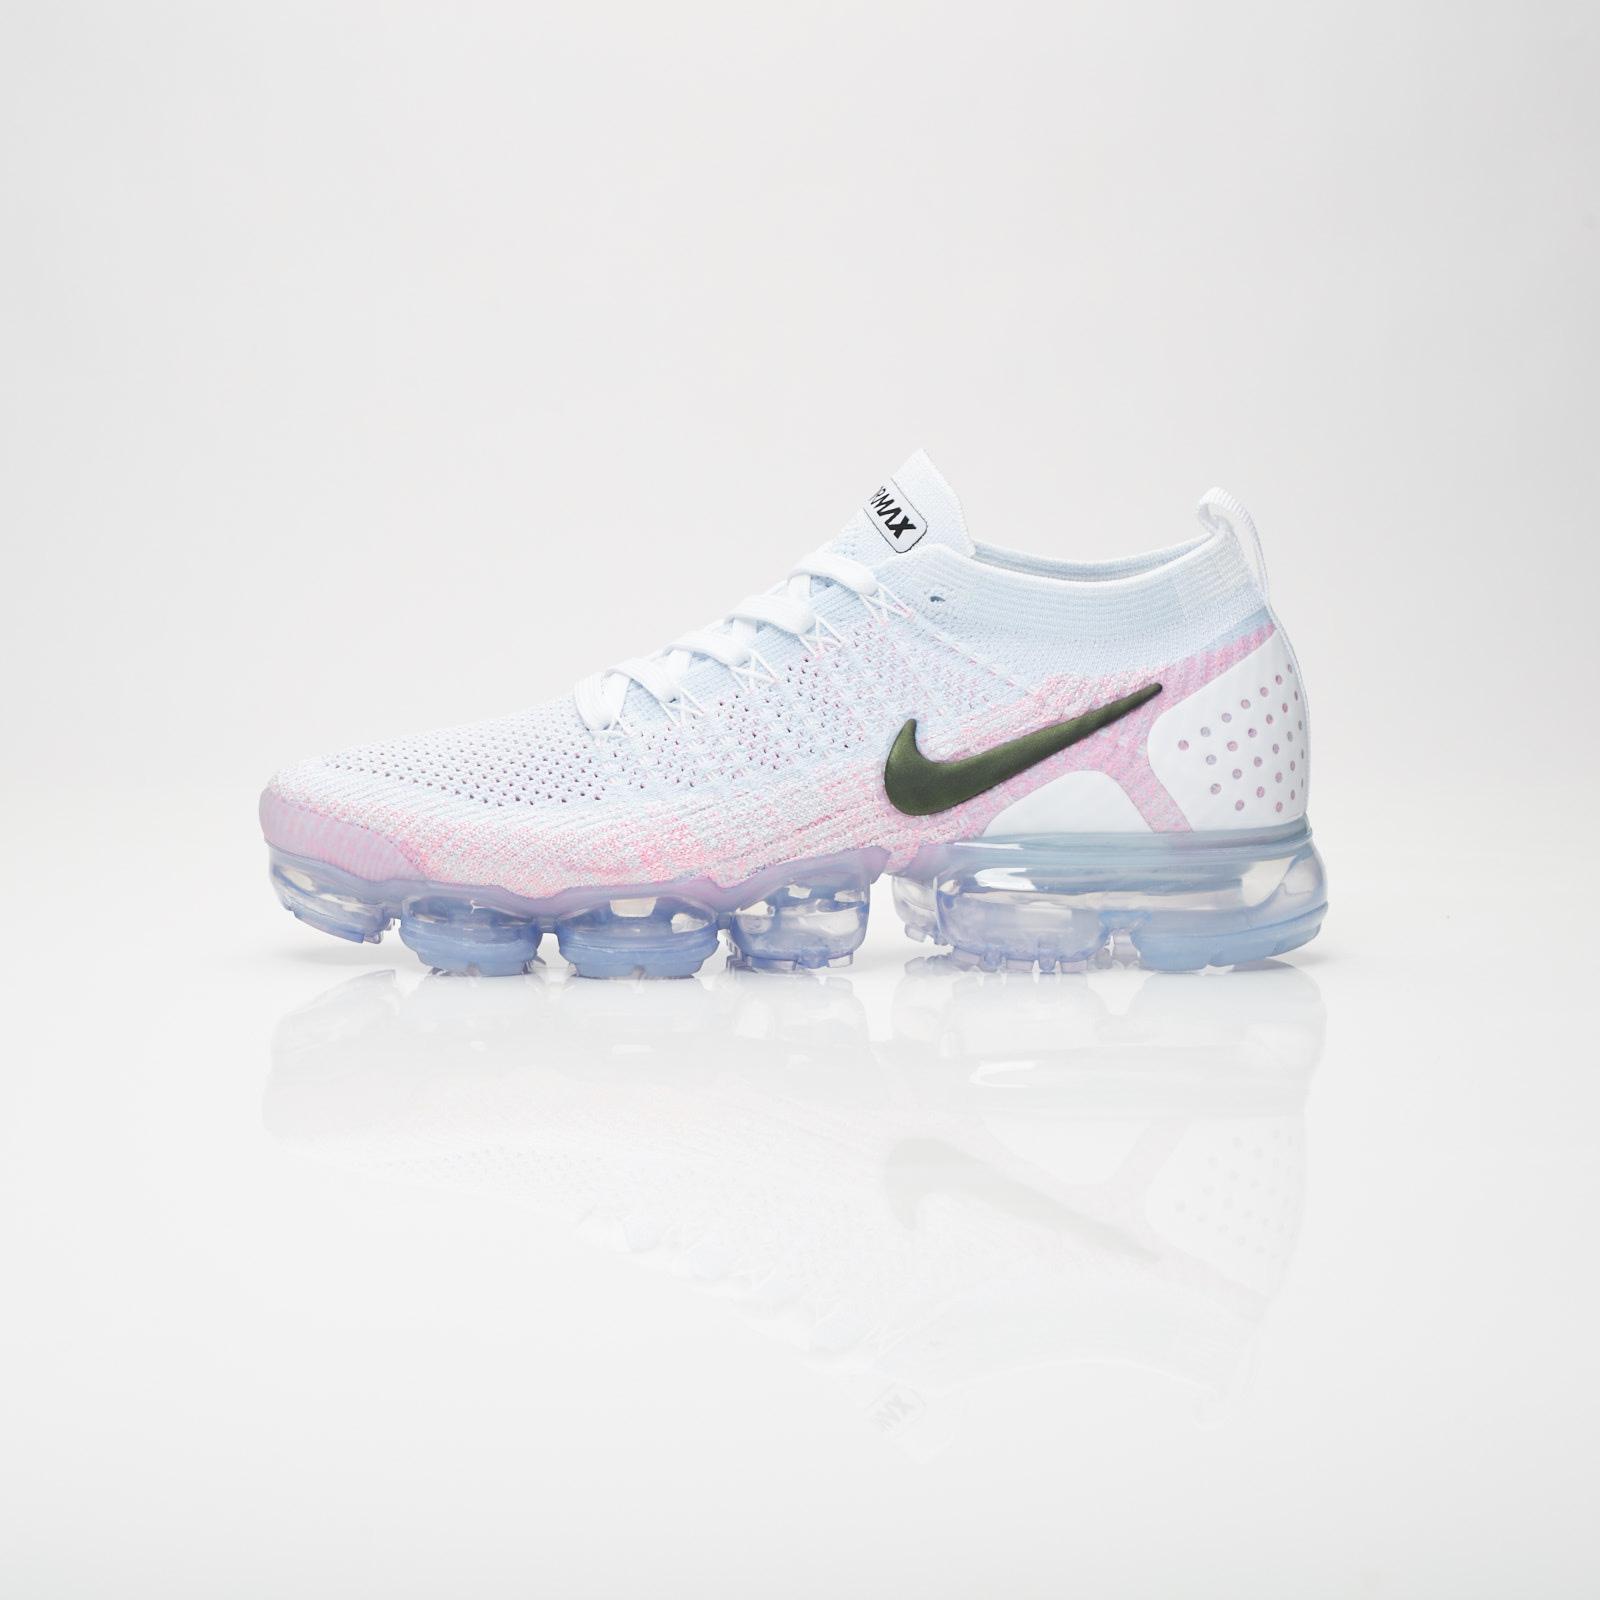 65afe5c4bb9c2 Nike Air Vapormax Flyknit 2 - 942842-102 - Sneakersnstuff